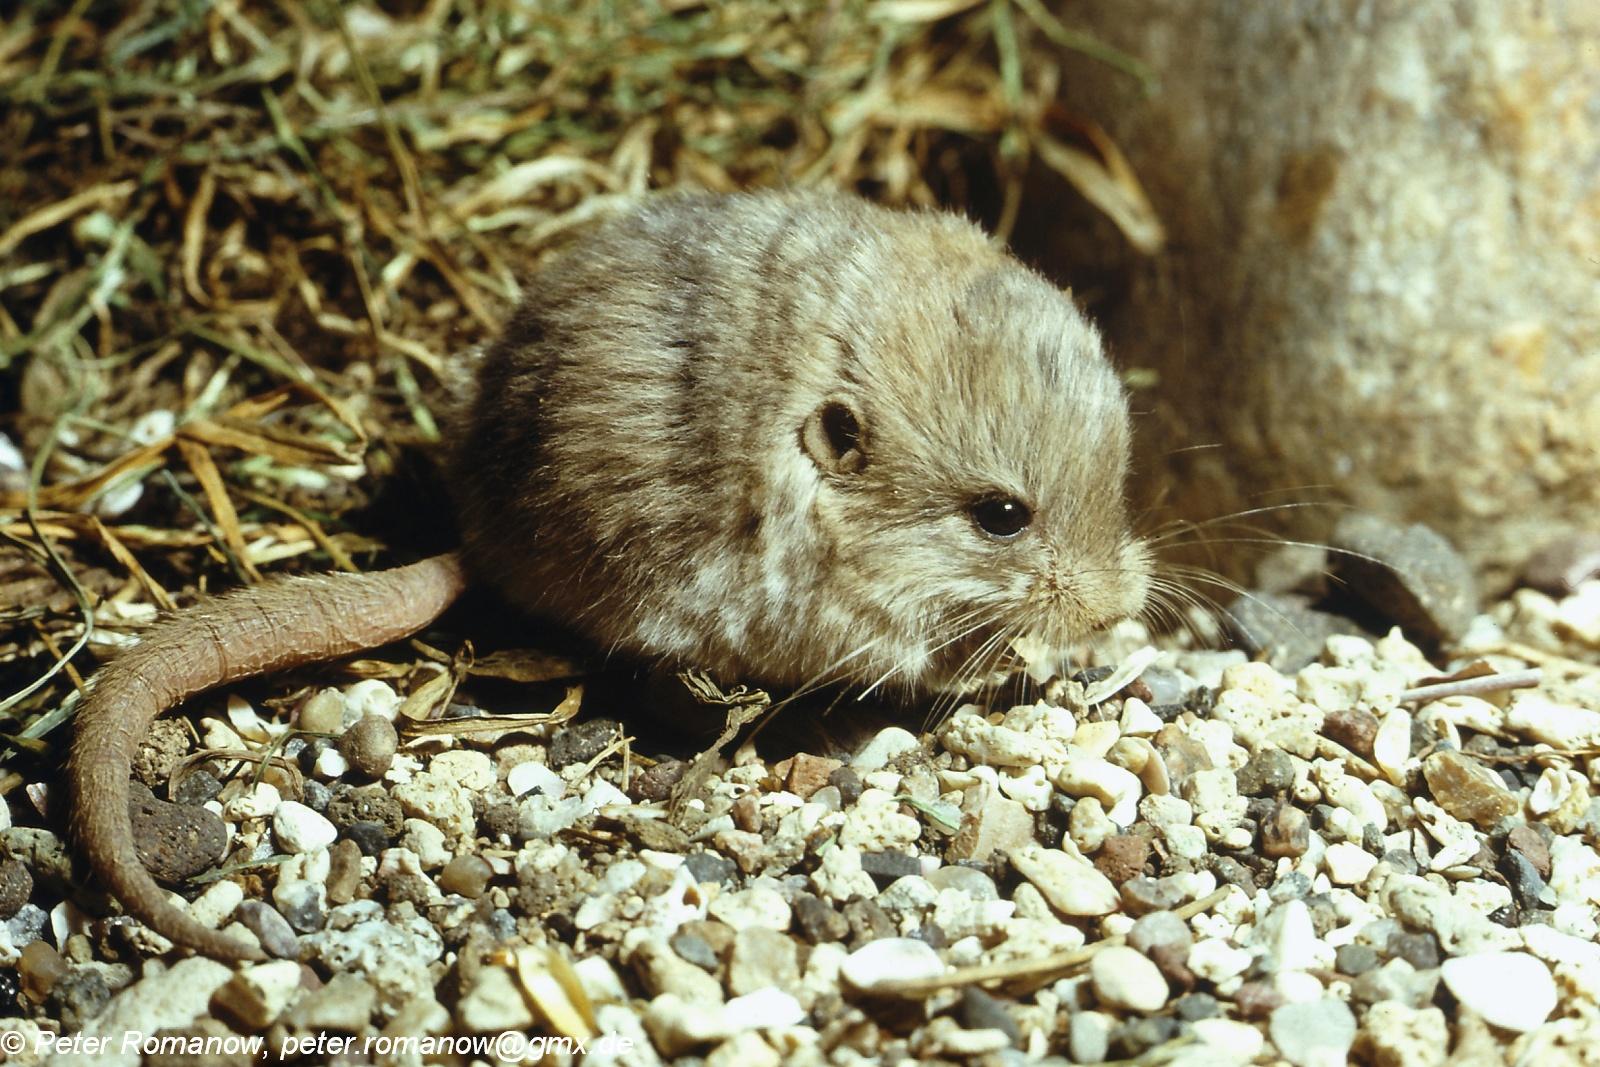 Image - Cardiocranius paradoxus (Five-toed Pygmy Jerboa ... - photo#10